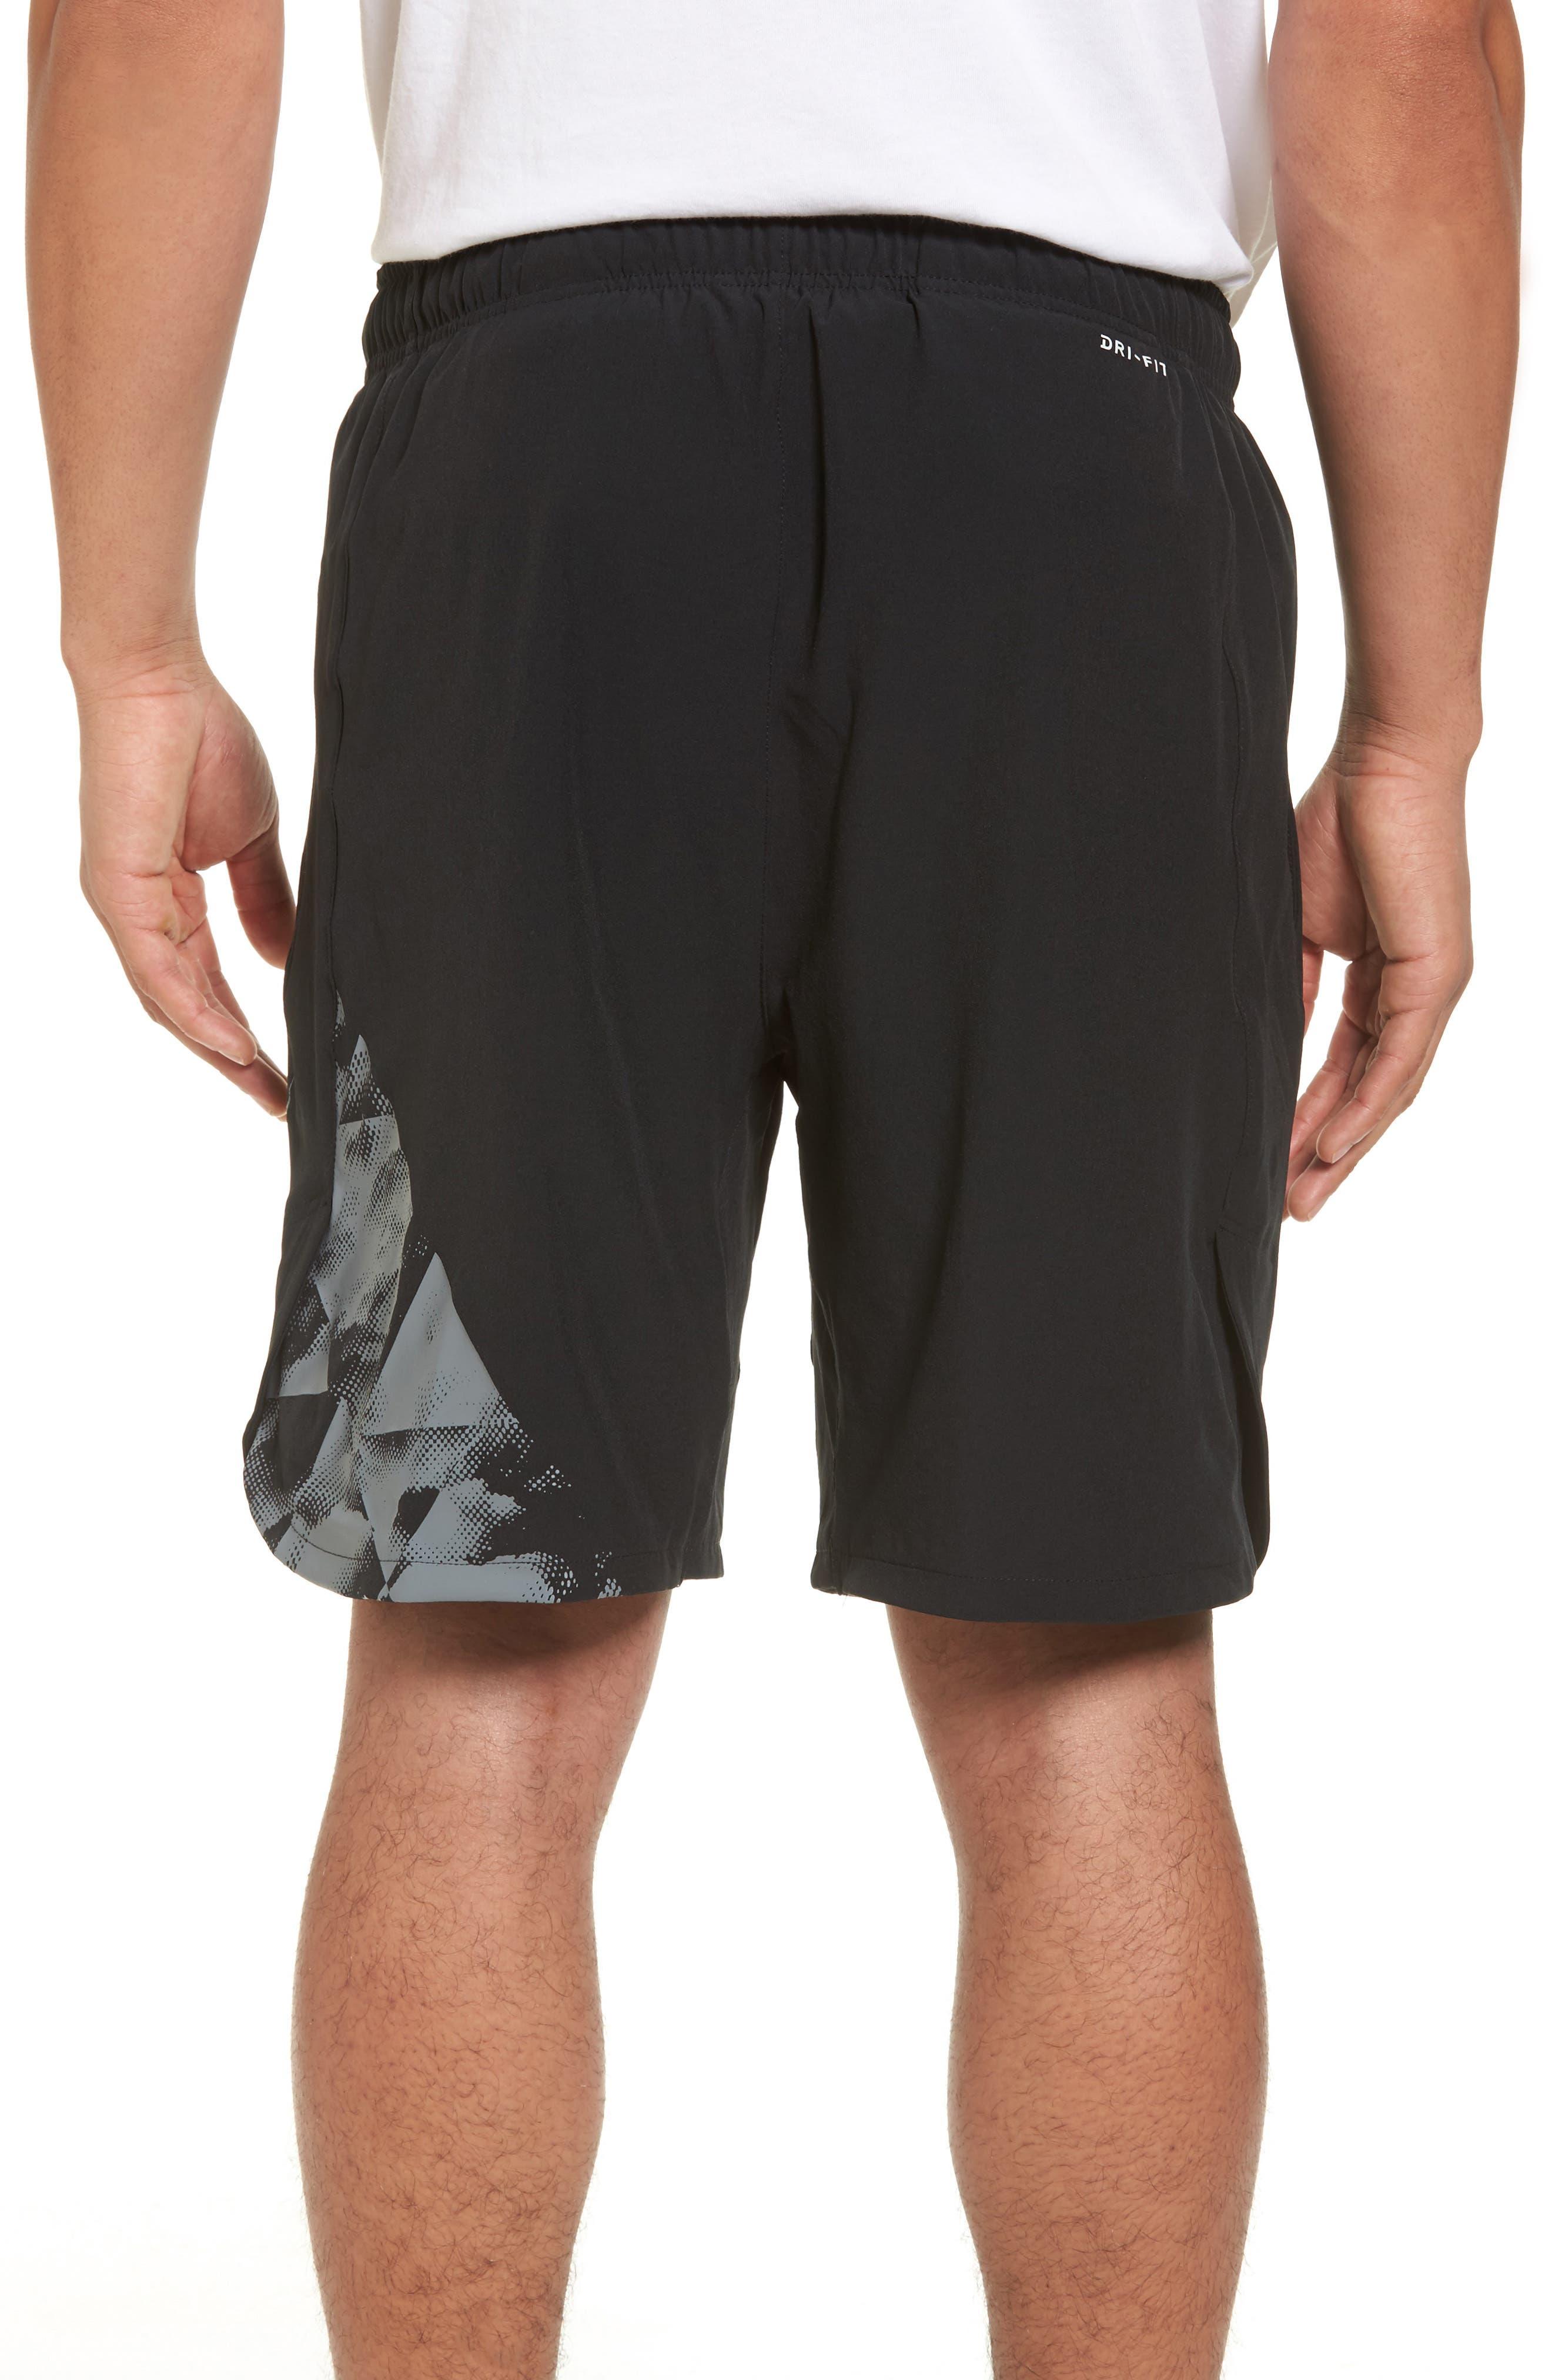 Flex Training Shorts,                             Alternate thumbnail 2, color,                             010